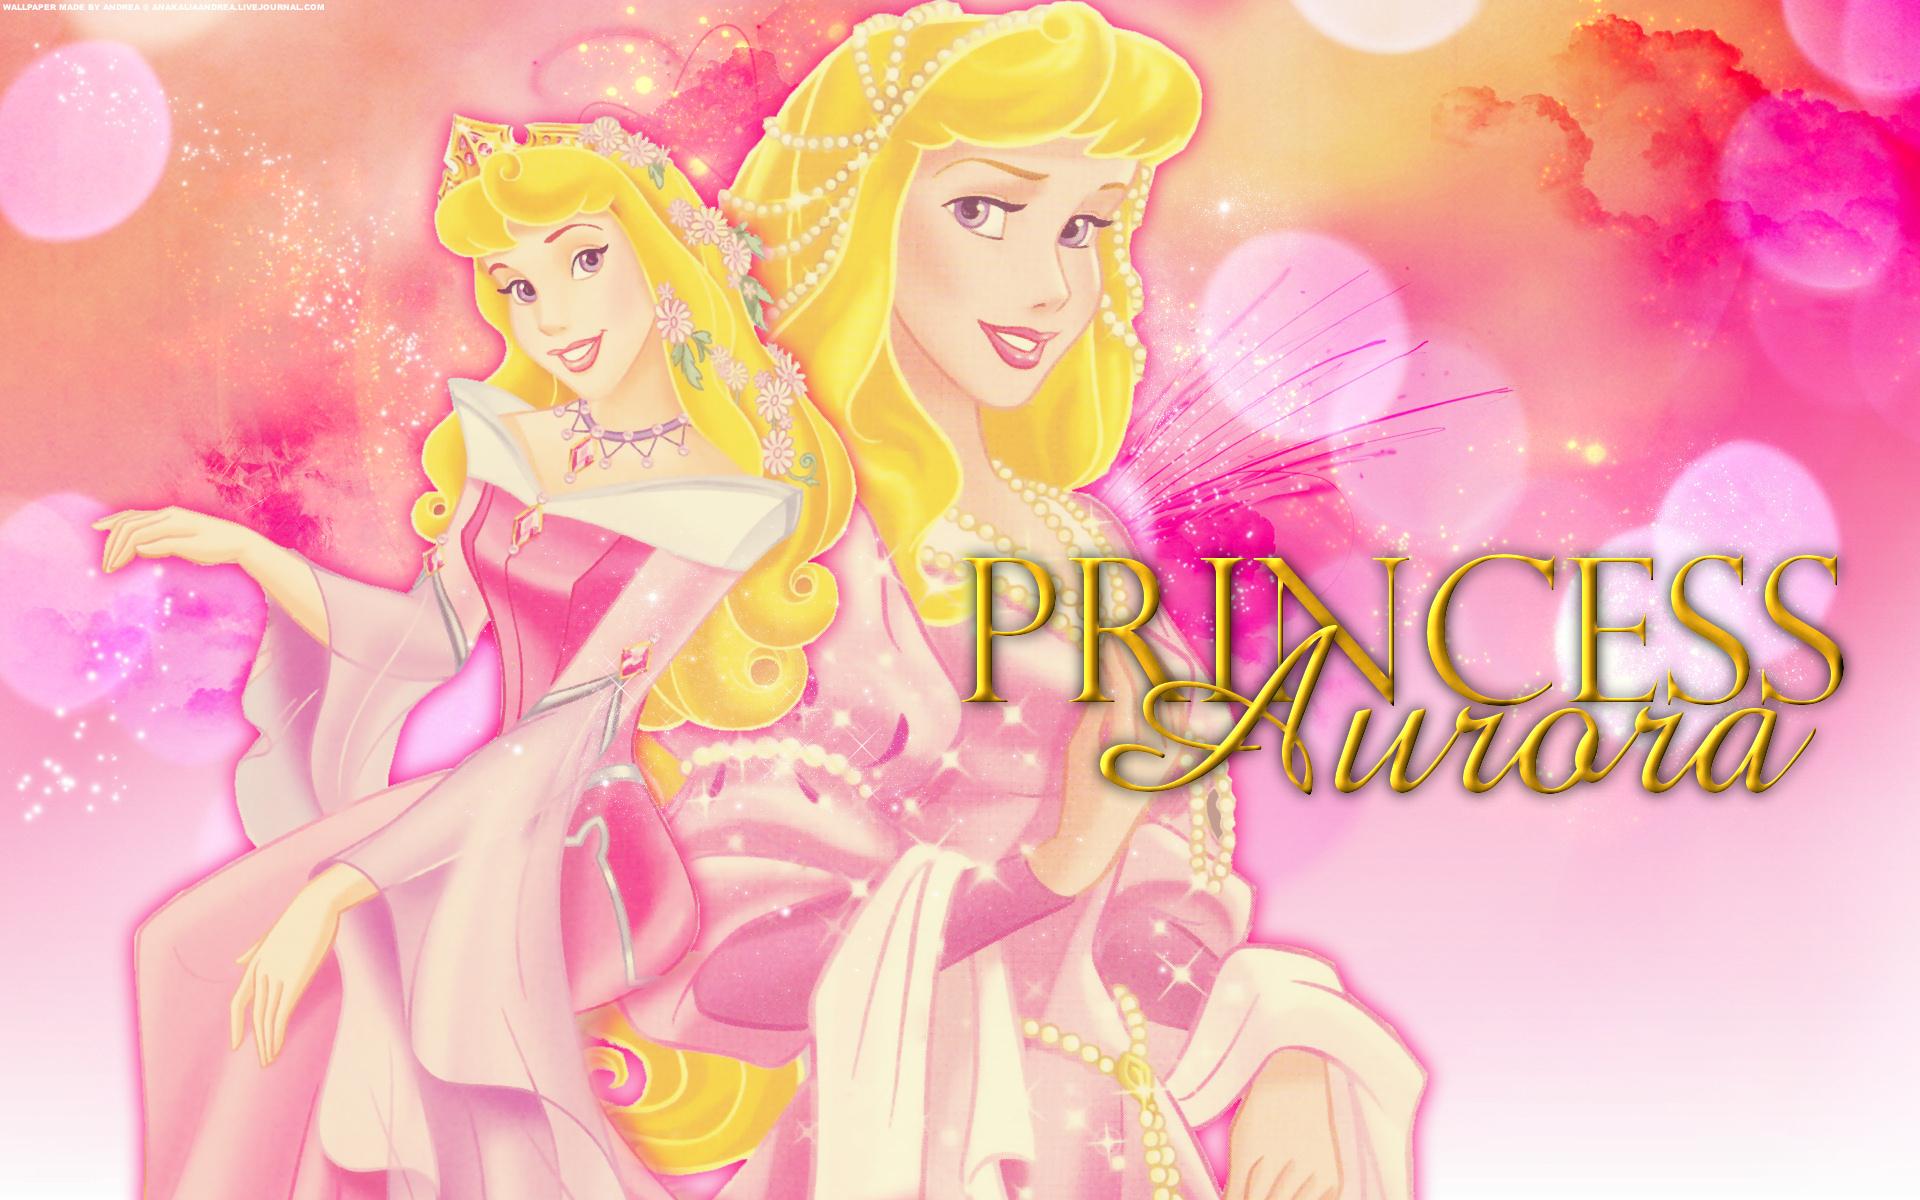 Princess-Aurora-disney-princess-6168144-1920-1200.jpg